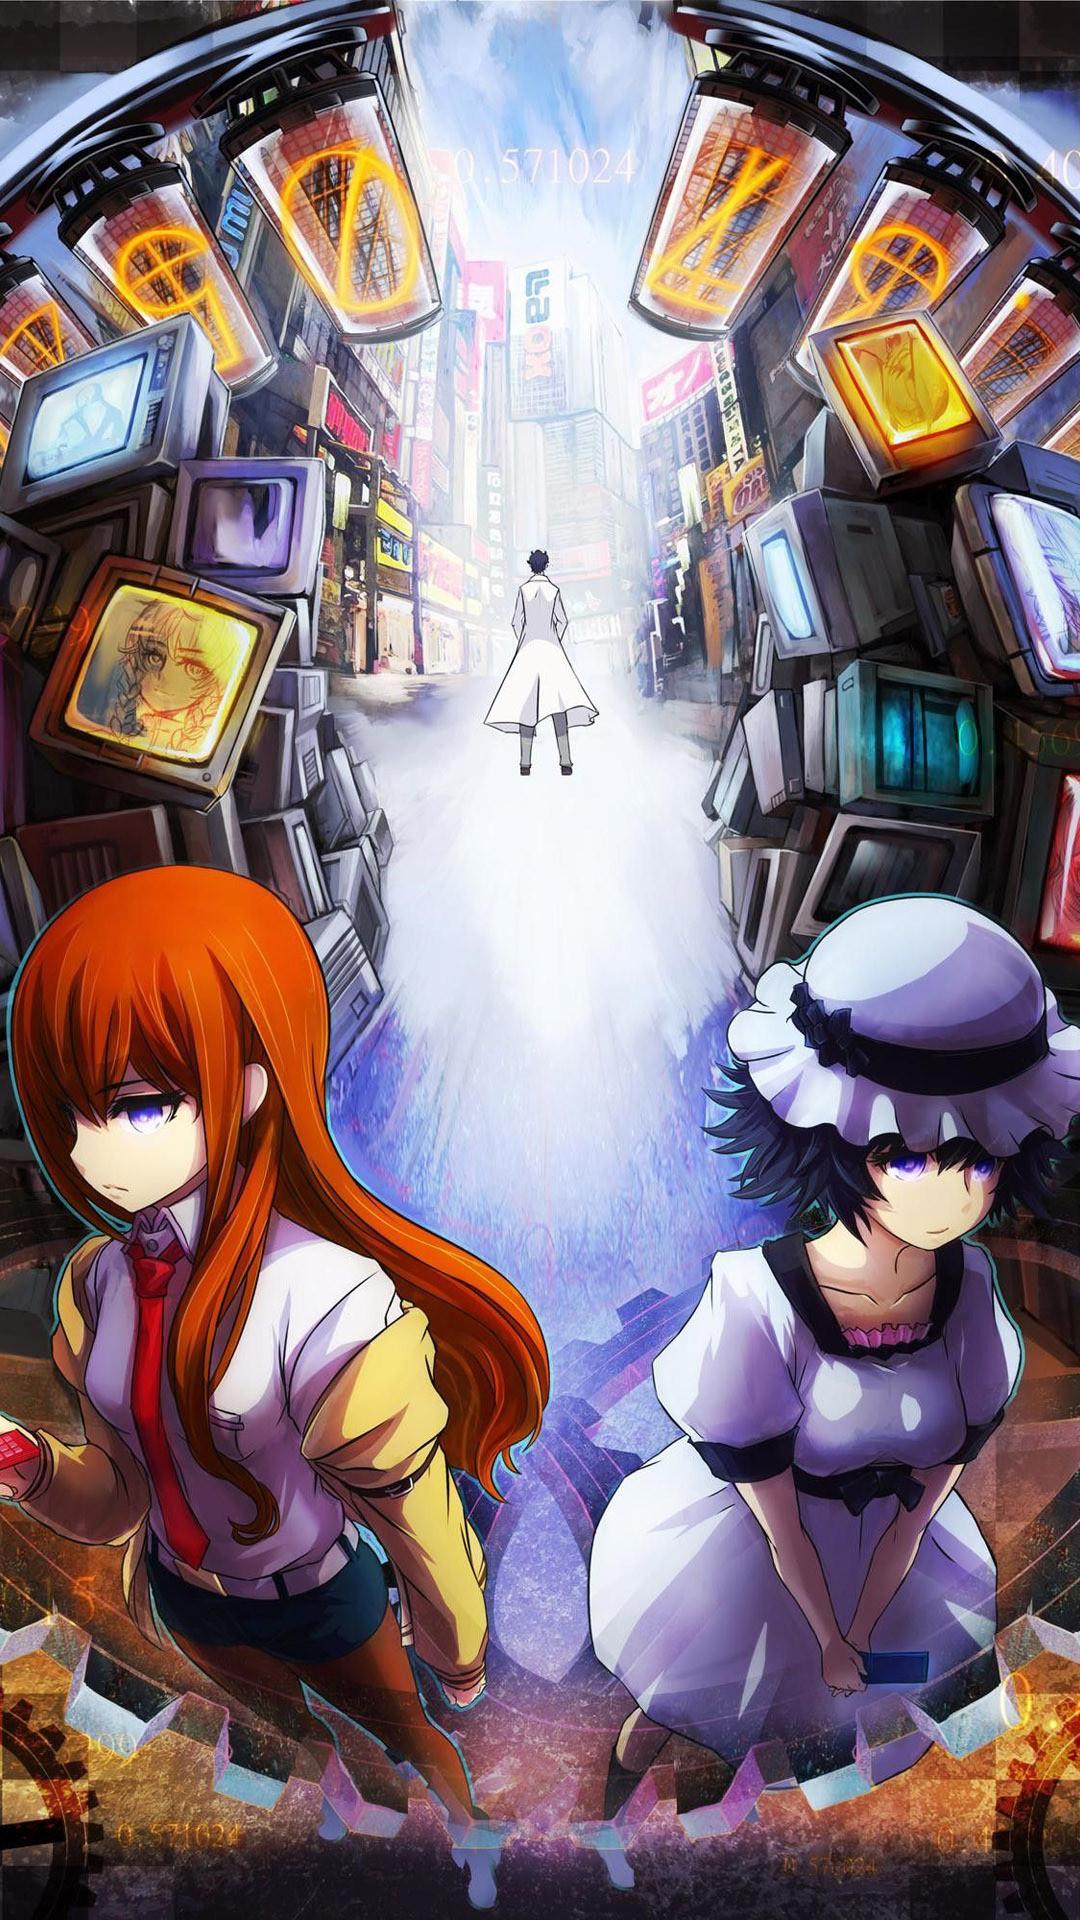 Stunning Anime Wallpaper For Mobile Android Wallpaper